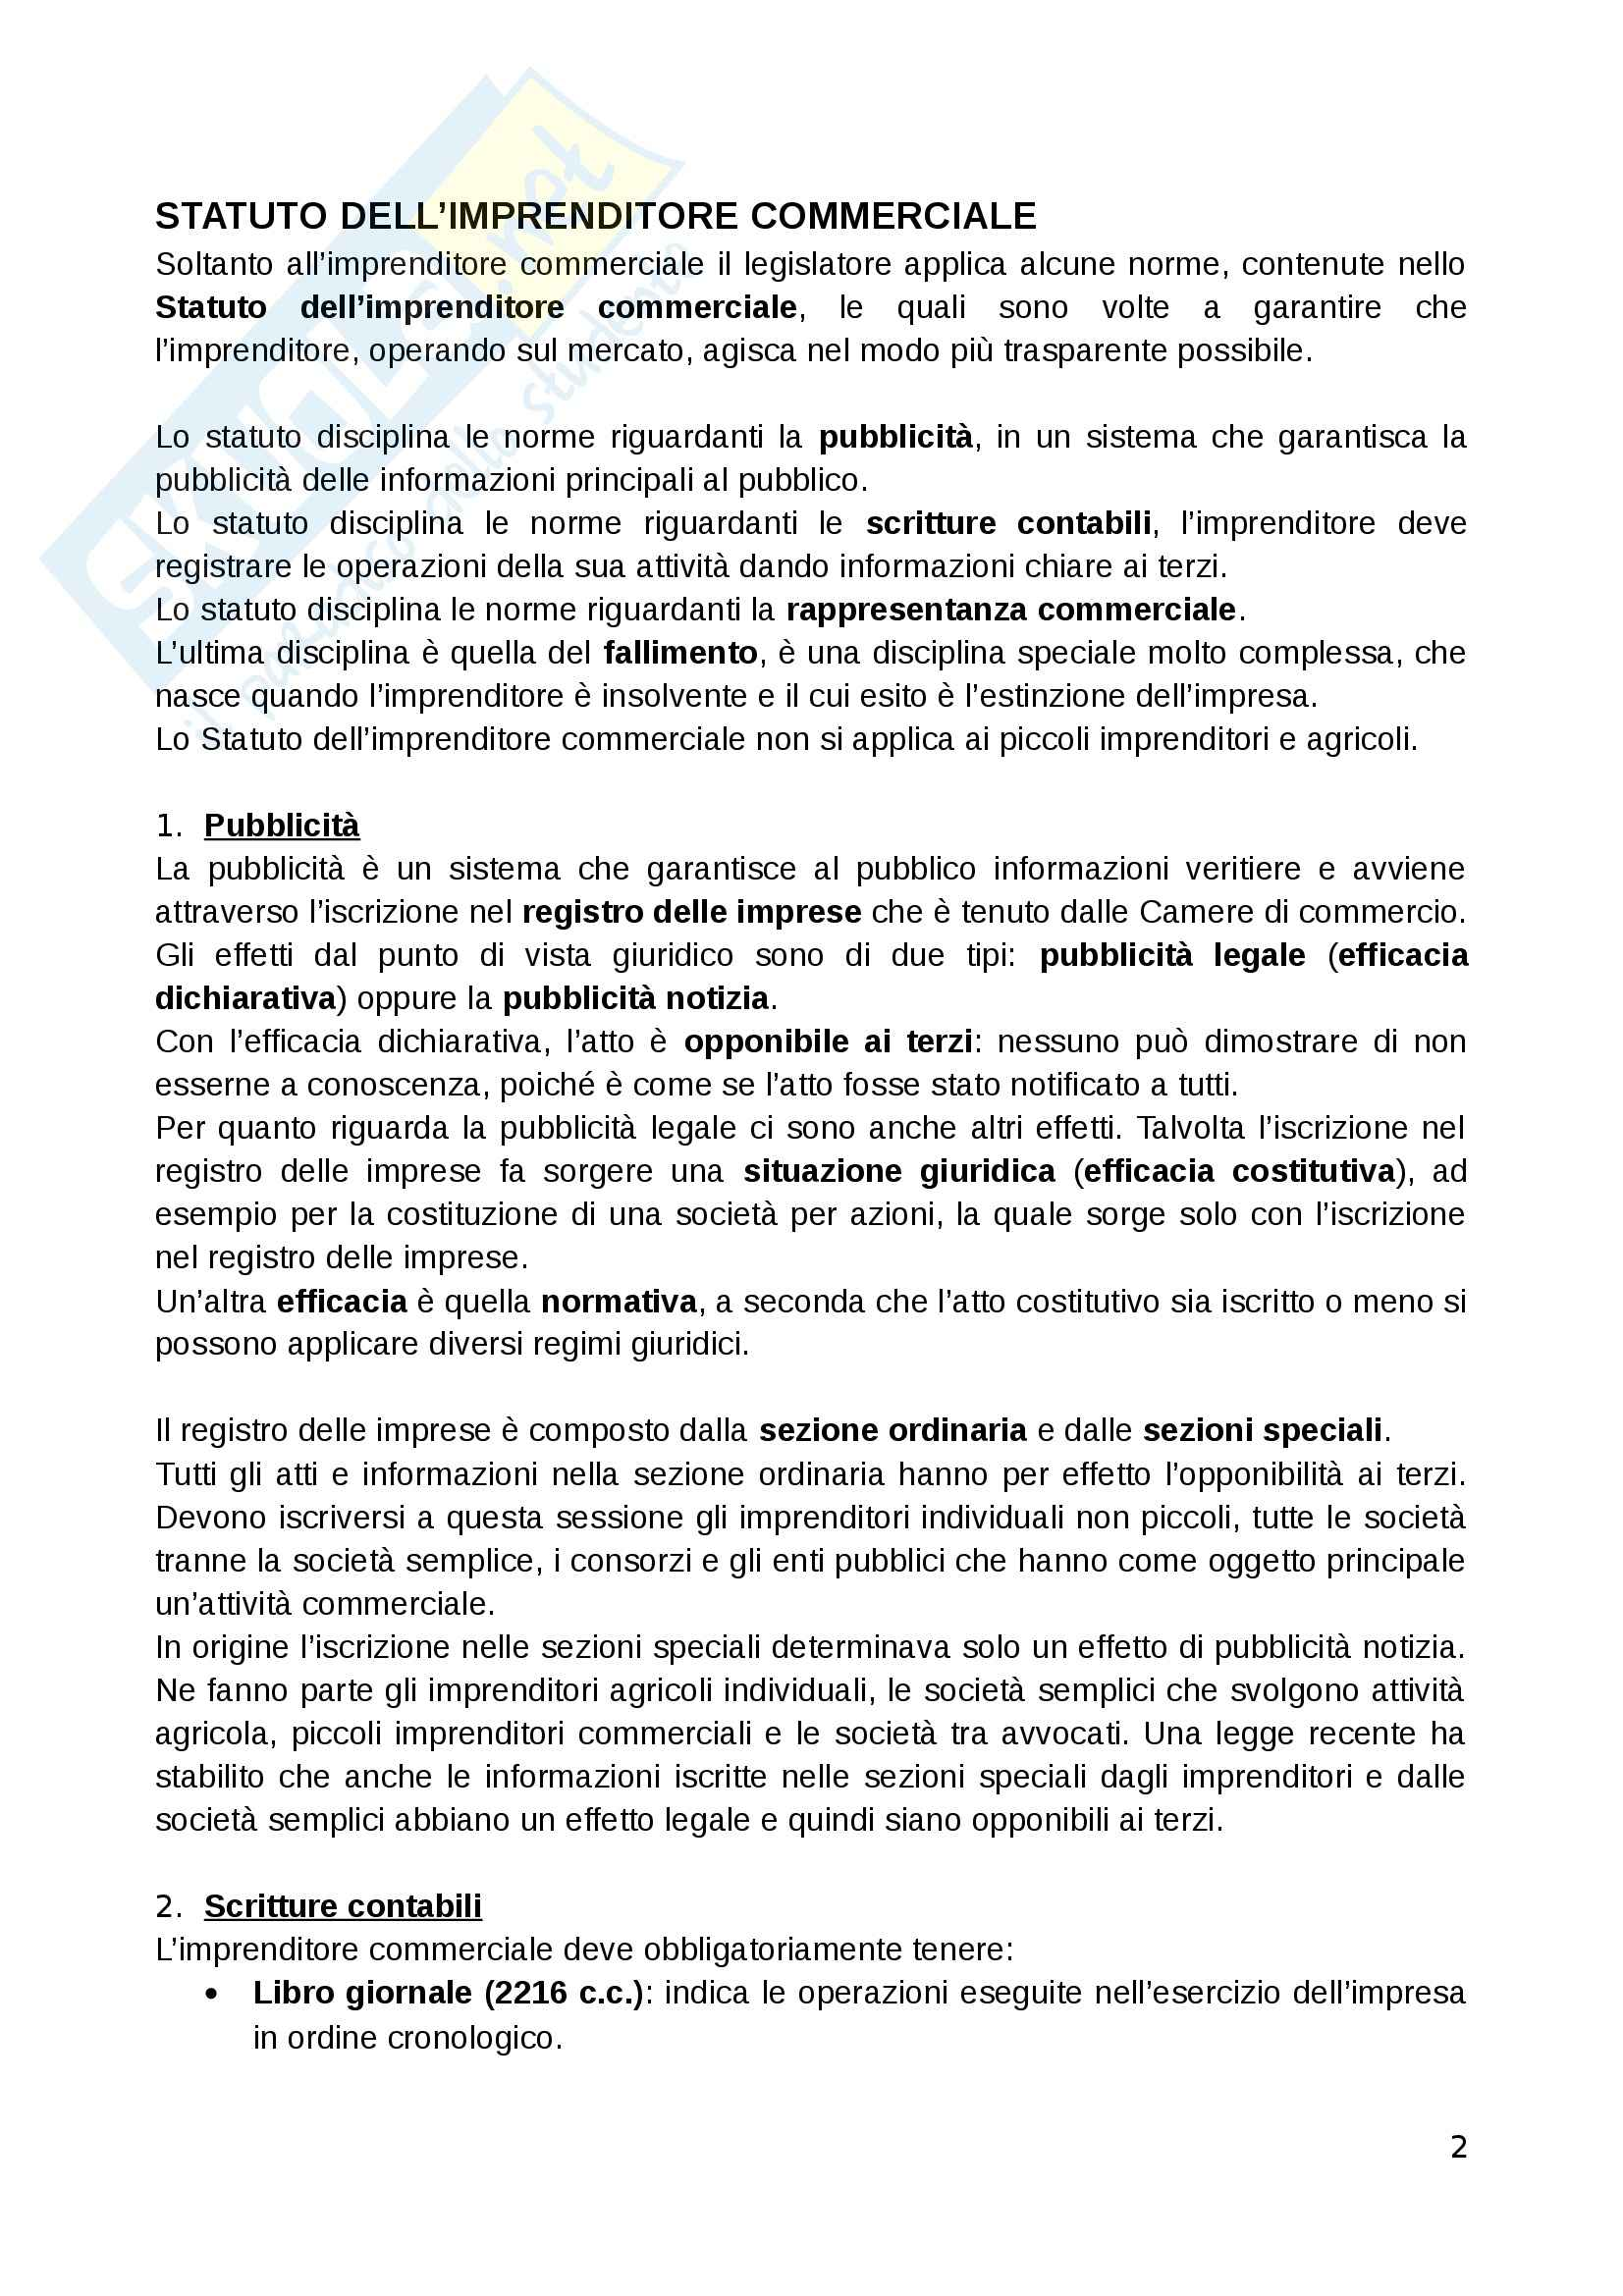 Diritto commerciale - Appunti Pag. 2